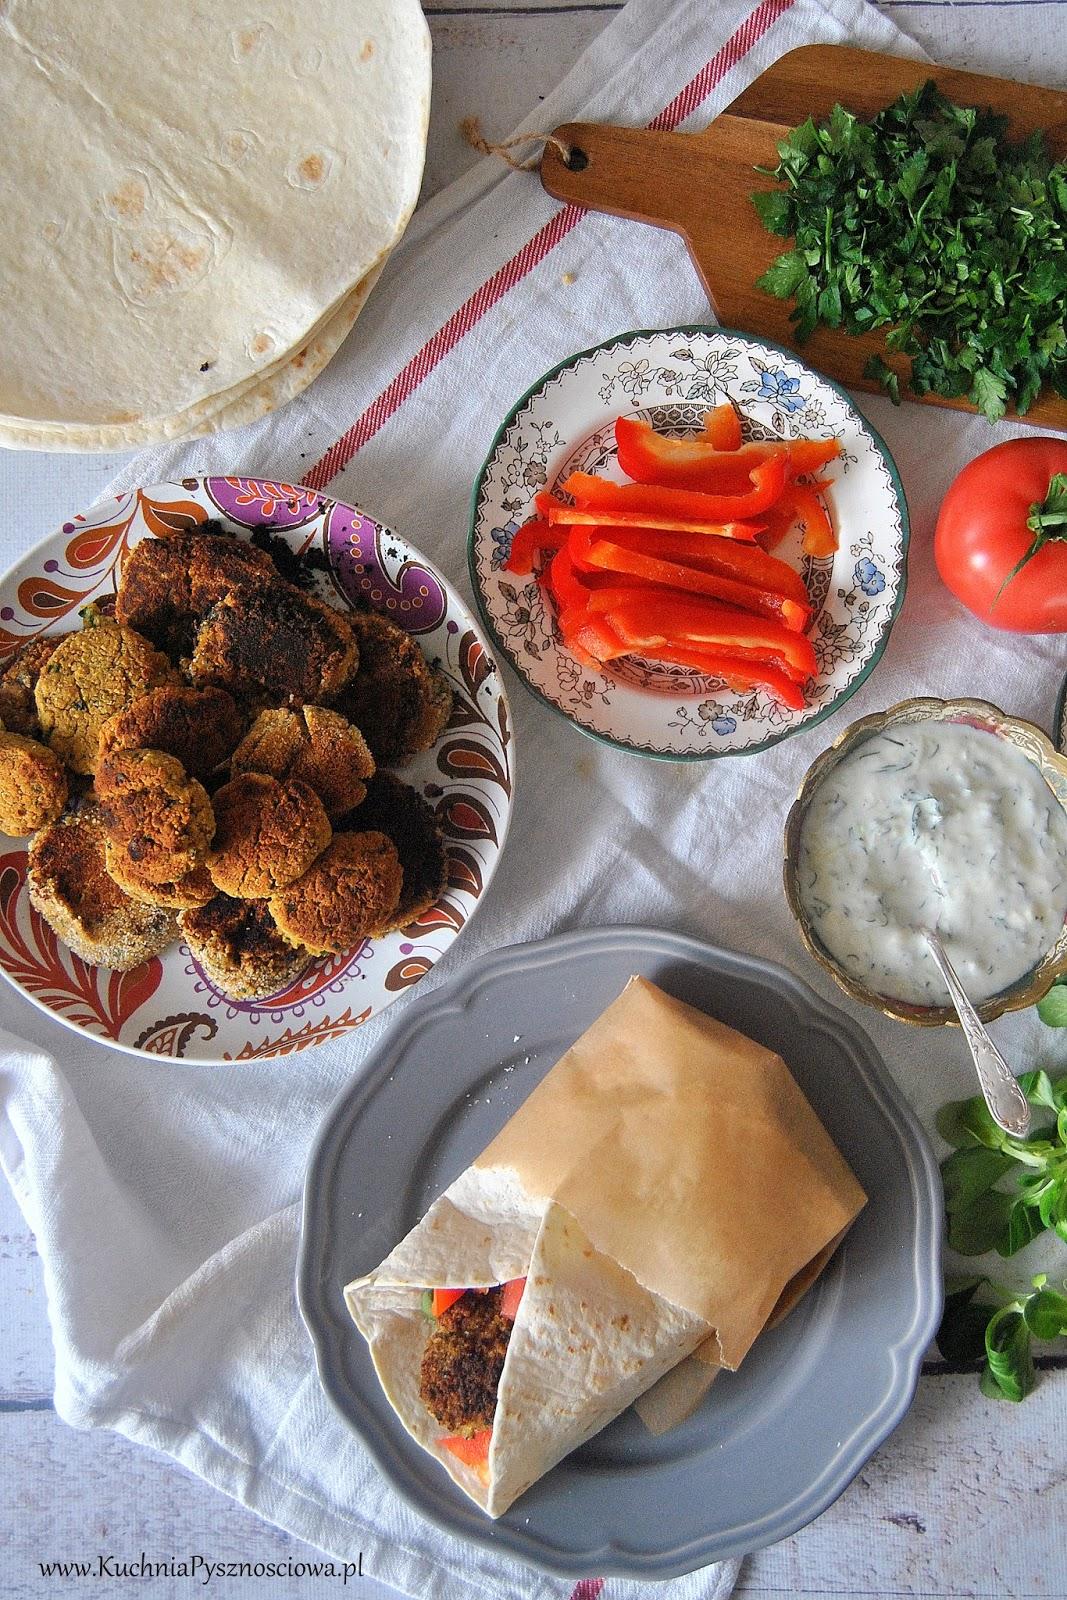 578 Domowy Falafel Kuchnia Pysznosciowa Blog Kulinarny